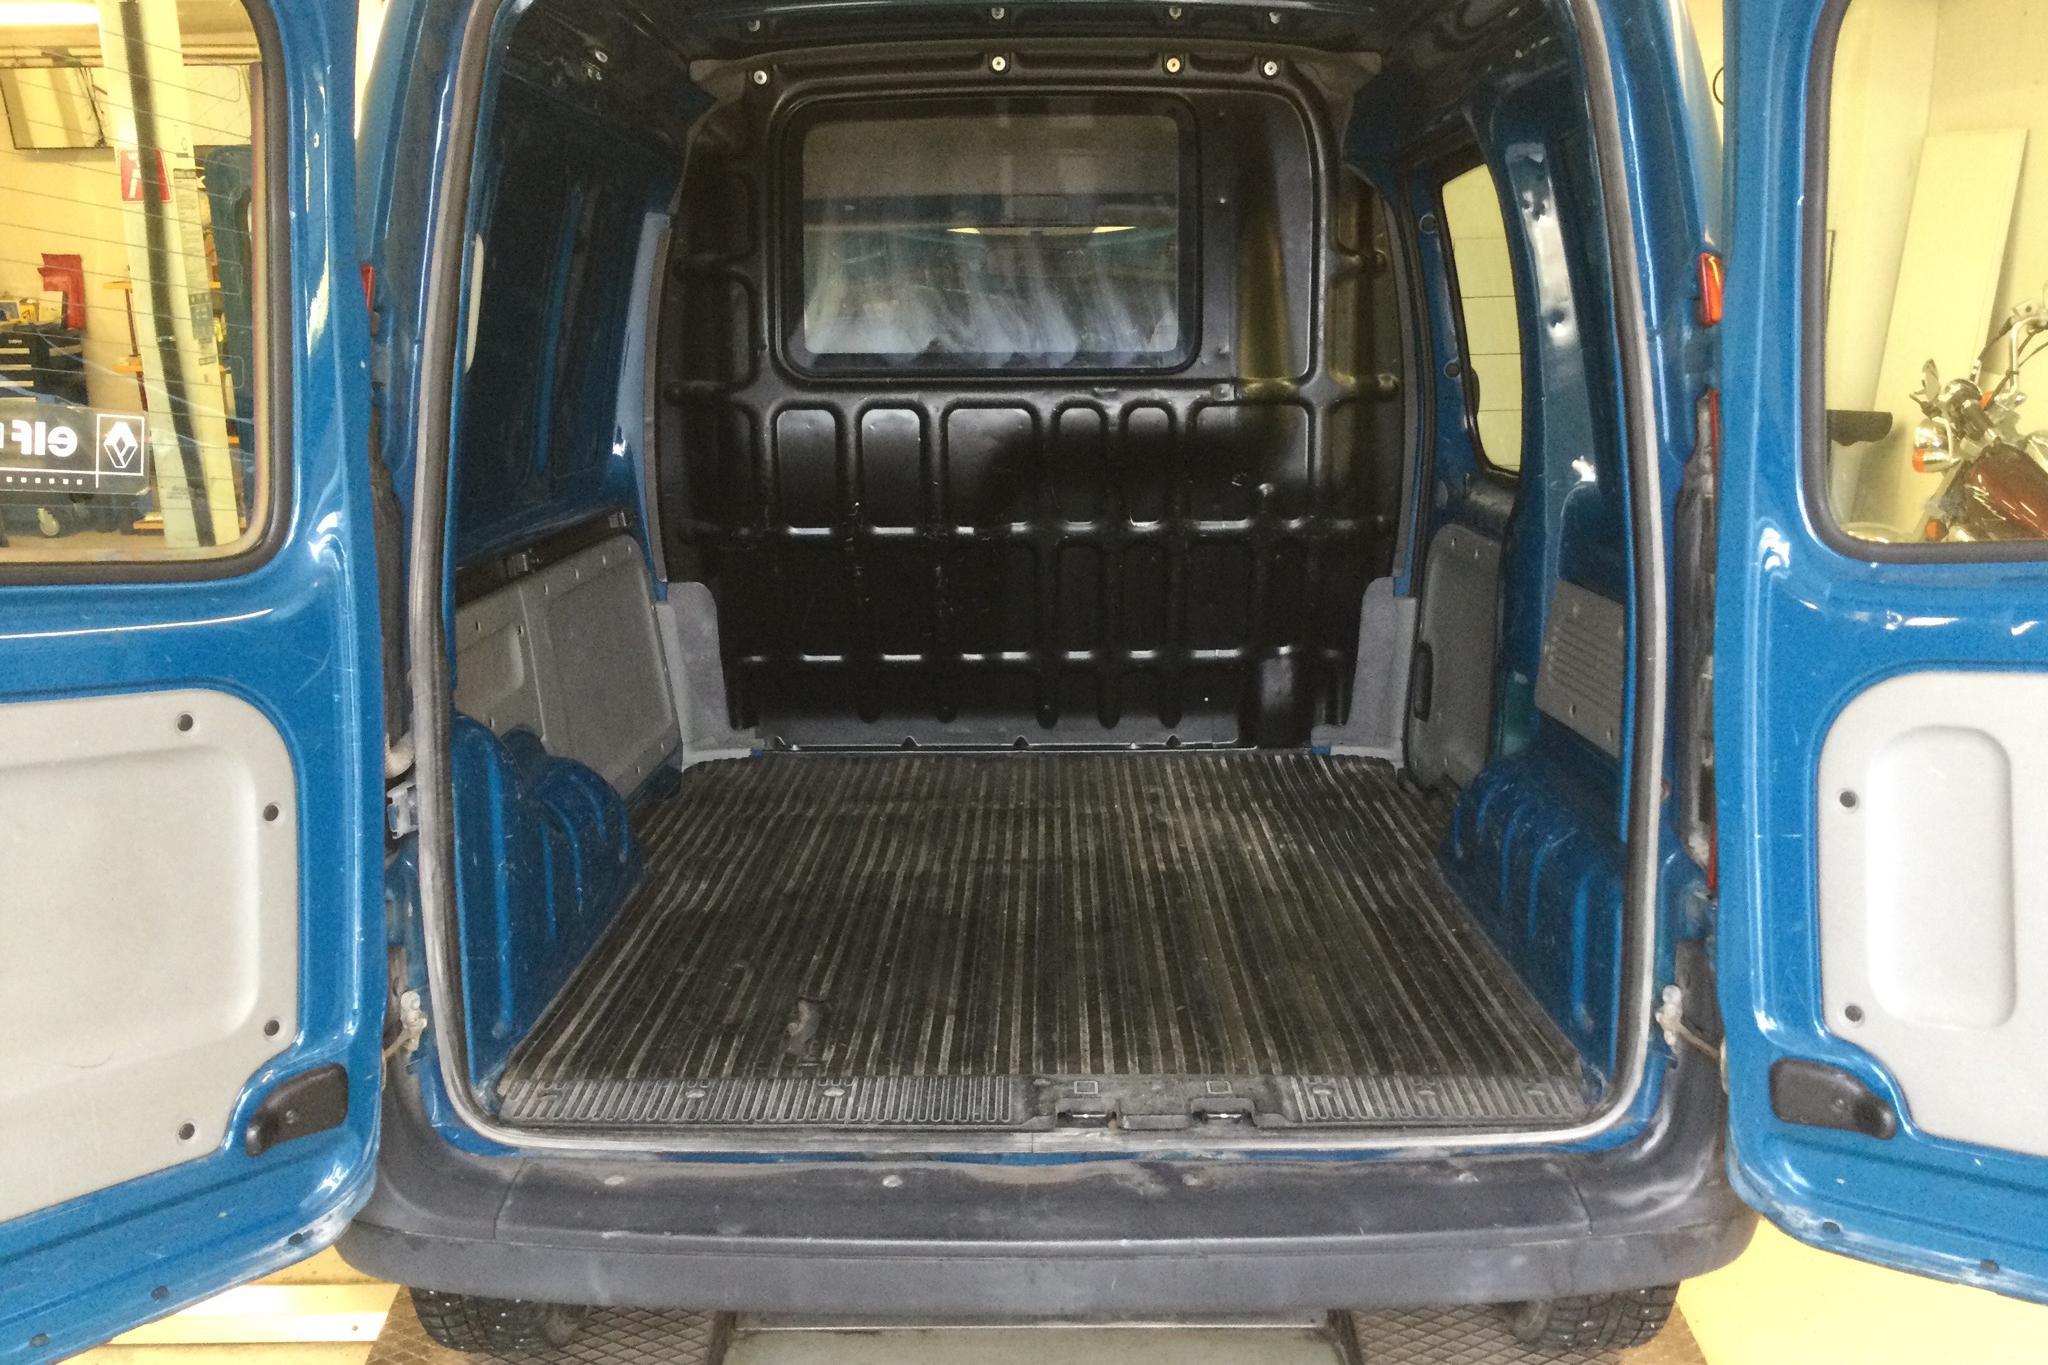 Renault Kangoo Express 1.5 dCi Skåp (65hk) - 66 740 km - Manual - Dark Blue - 2004